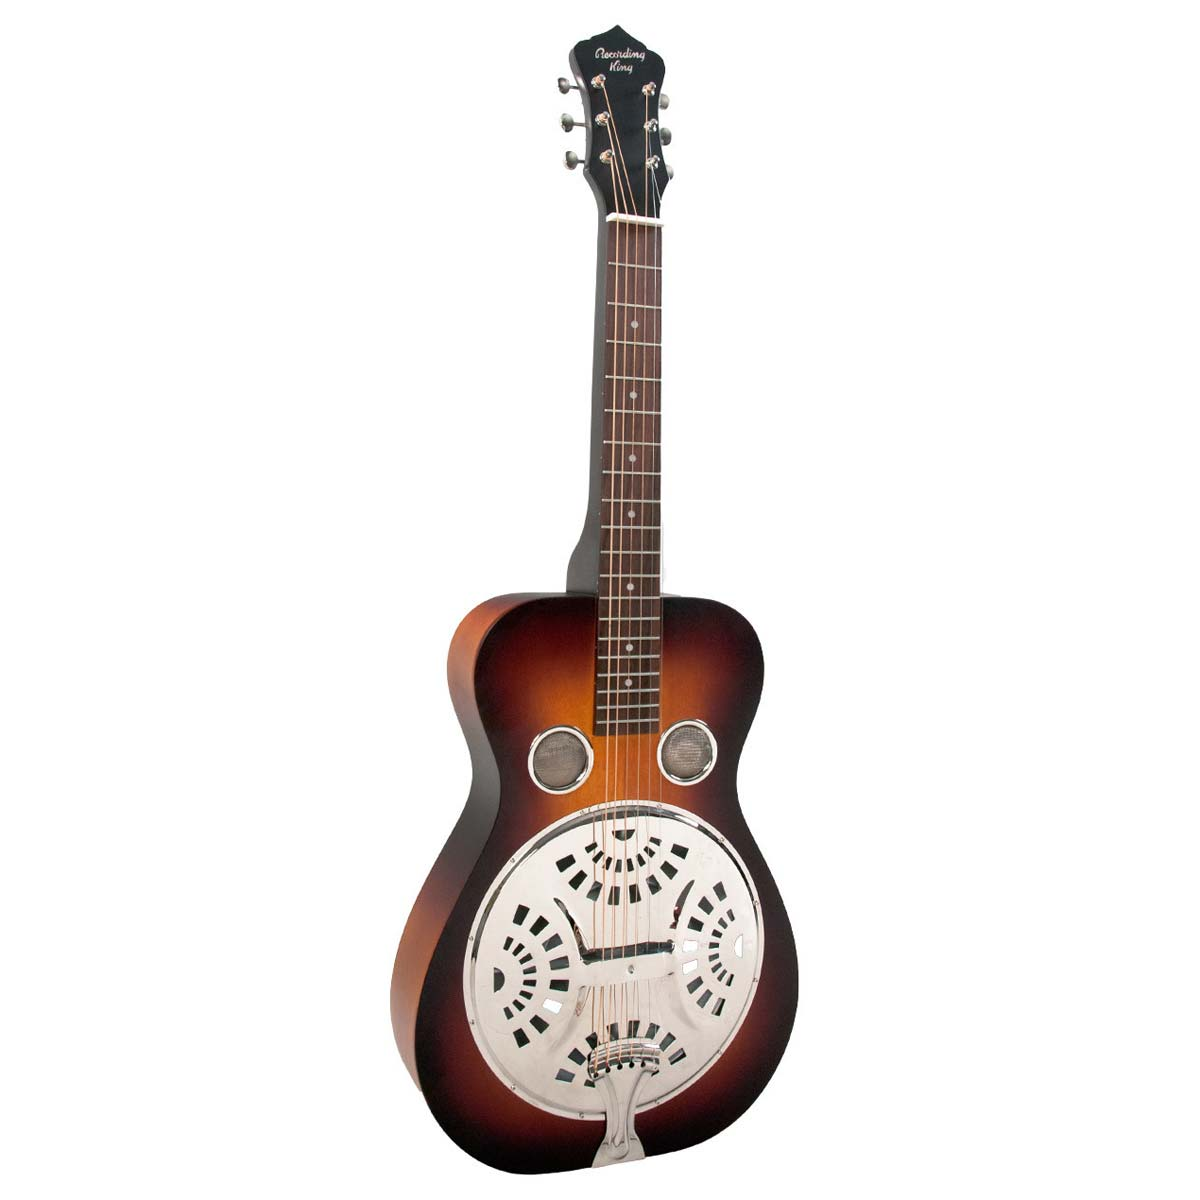 Recording King RR-65-VS squareneckresonator-guitar Vintage Sunburst